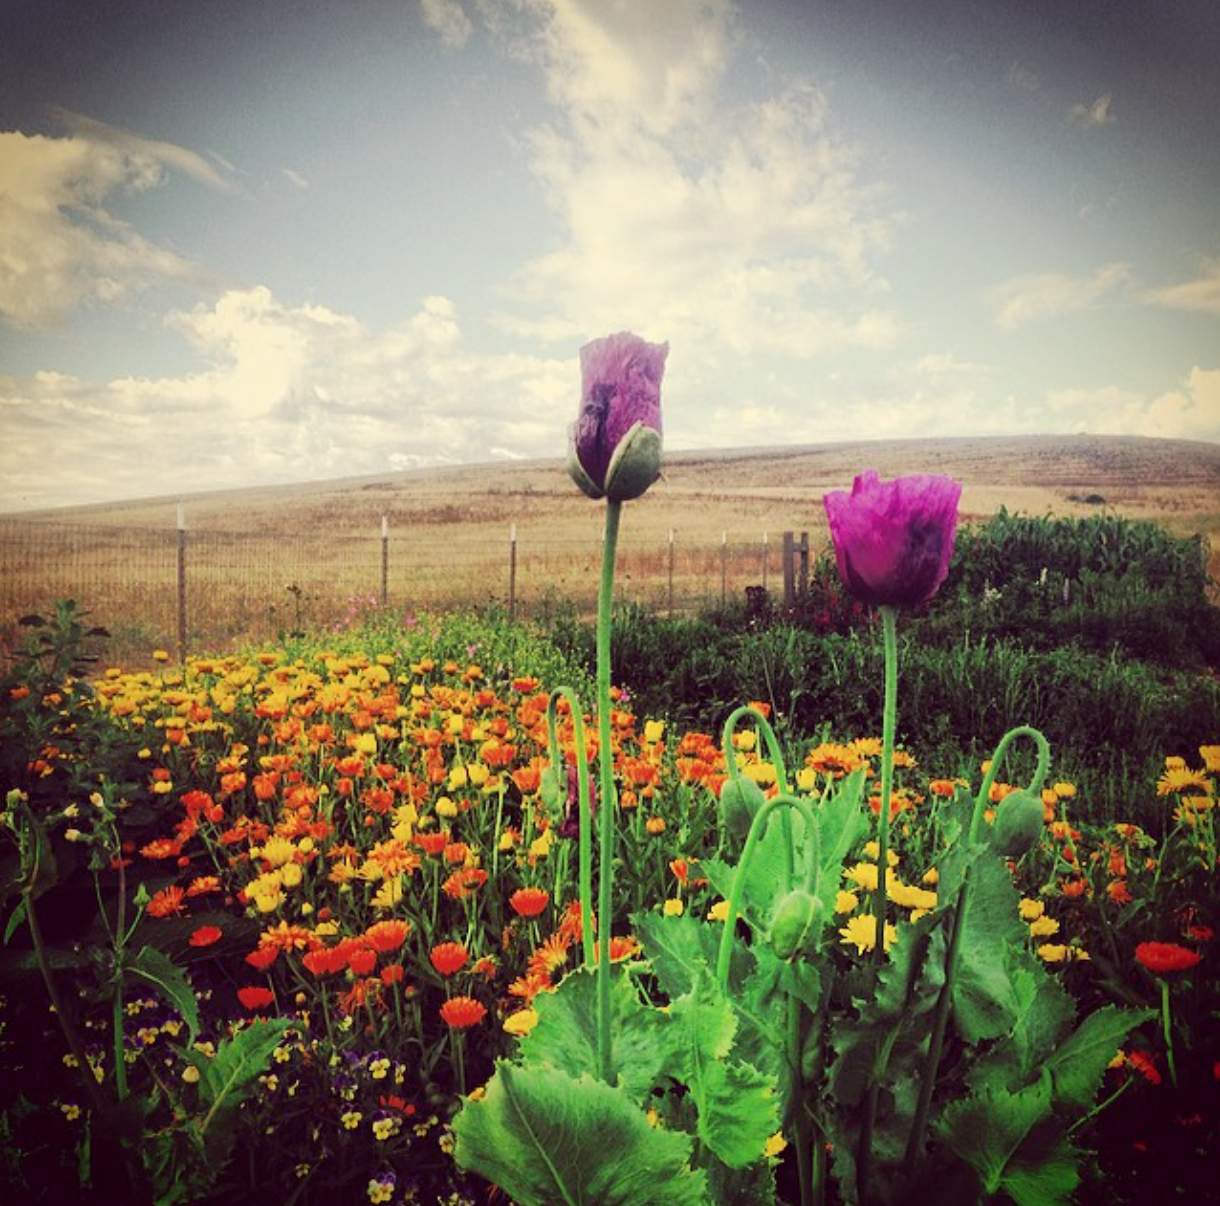 caleyflower.jpg